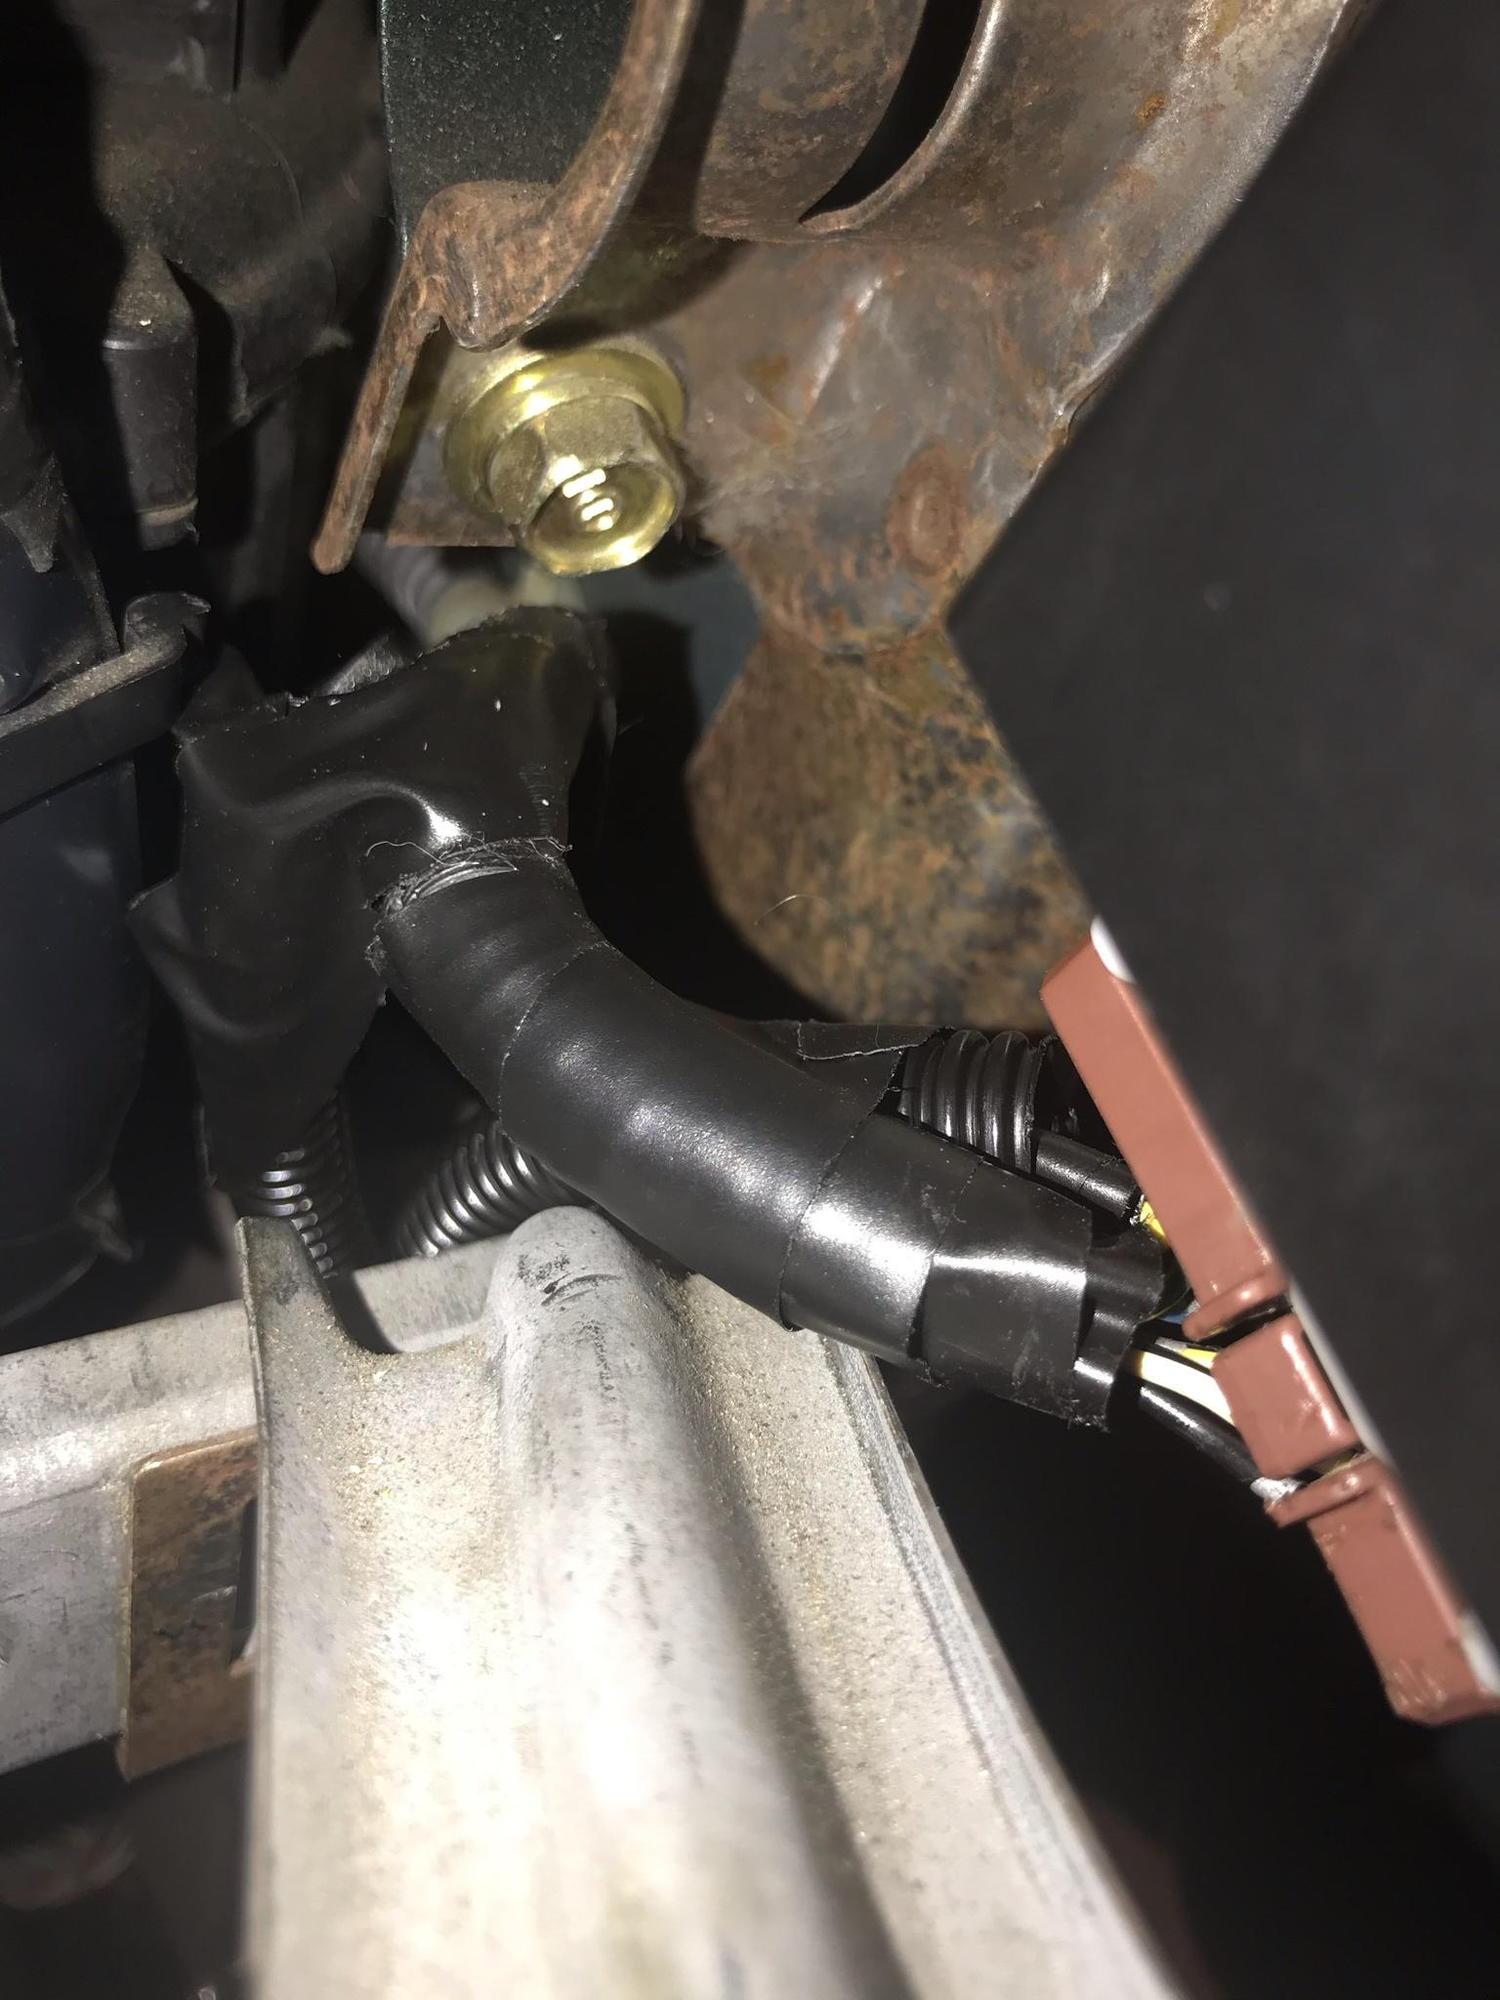 1999 Civic Ex Coupe Pgm-fi  Fuel Pump Relay Kill Switch Install - Honda-tech